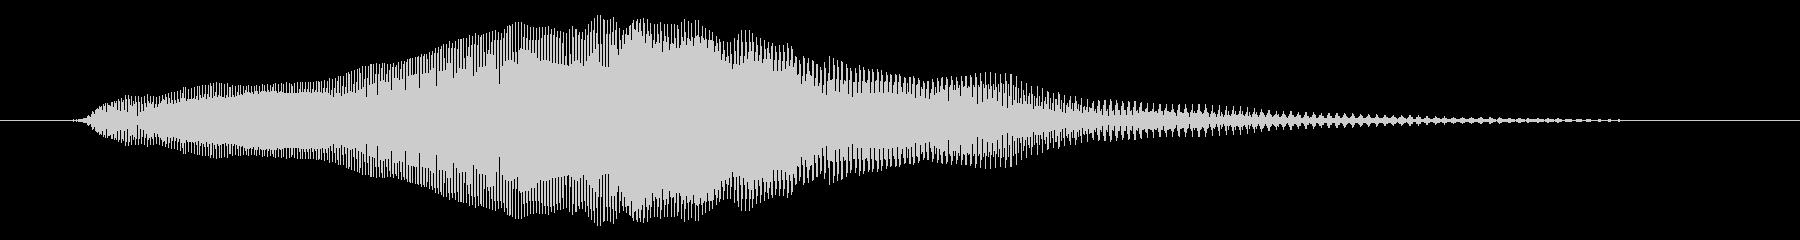 goal(高音)の未再生の波形